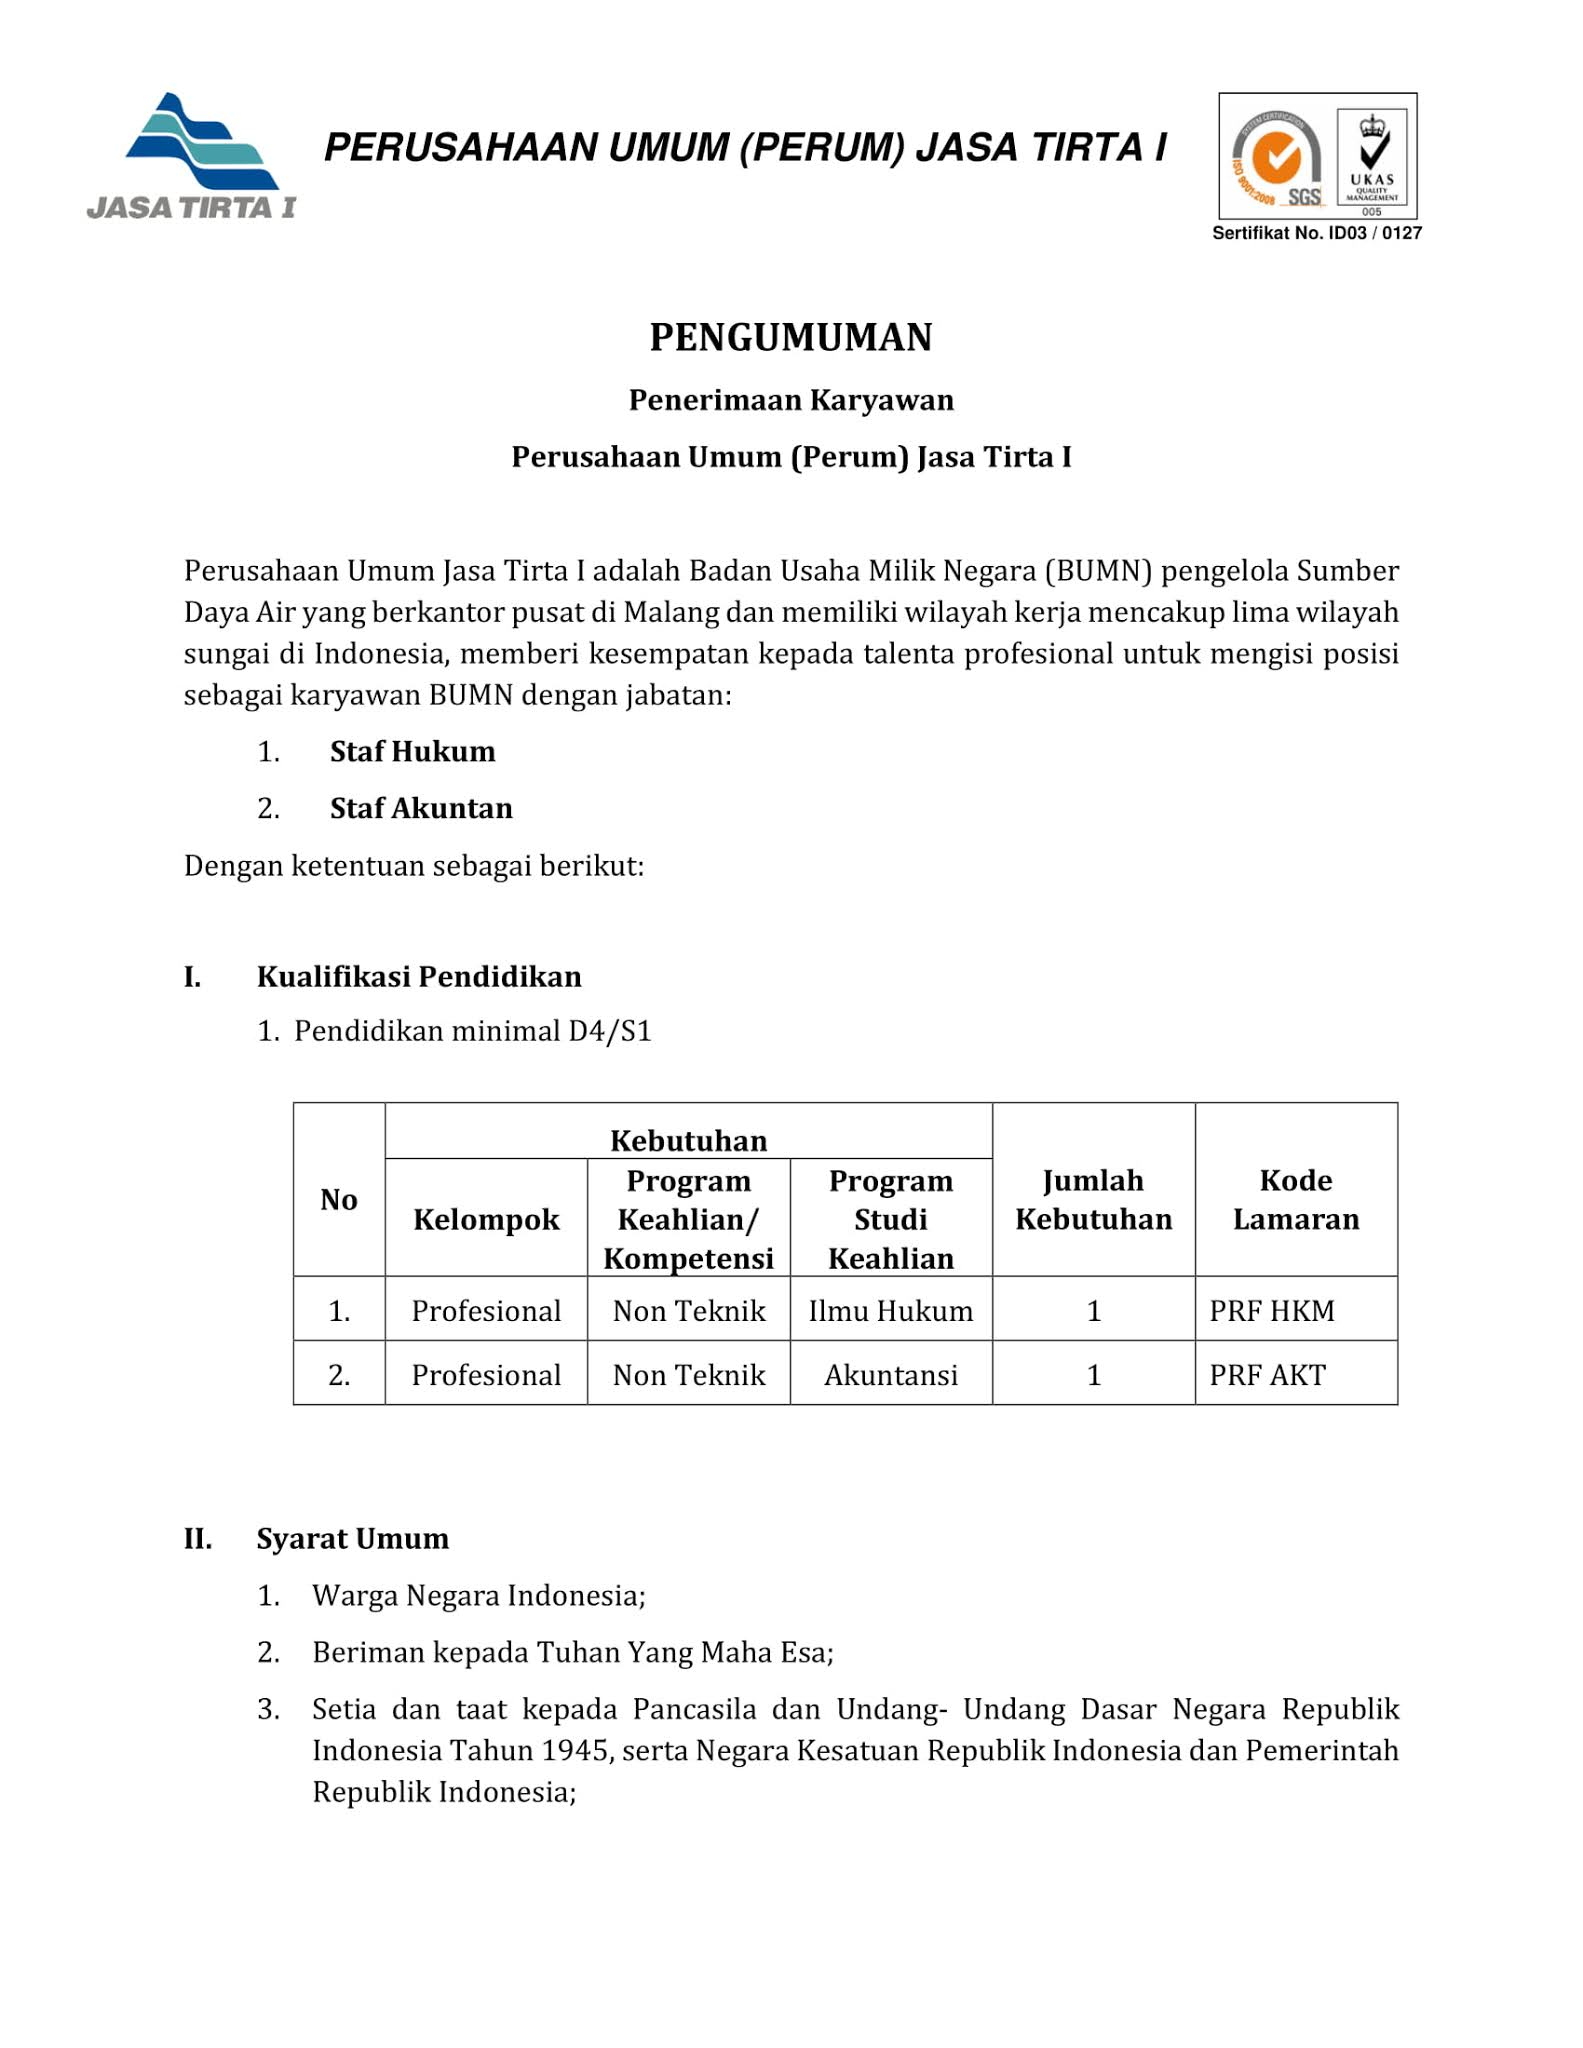 Lowongan Kerja BUMN Perusahaan Umum Jasa Tirta I Mei 2021